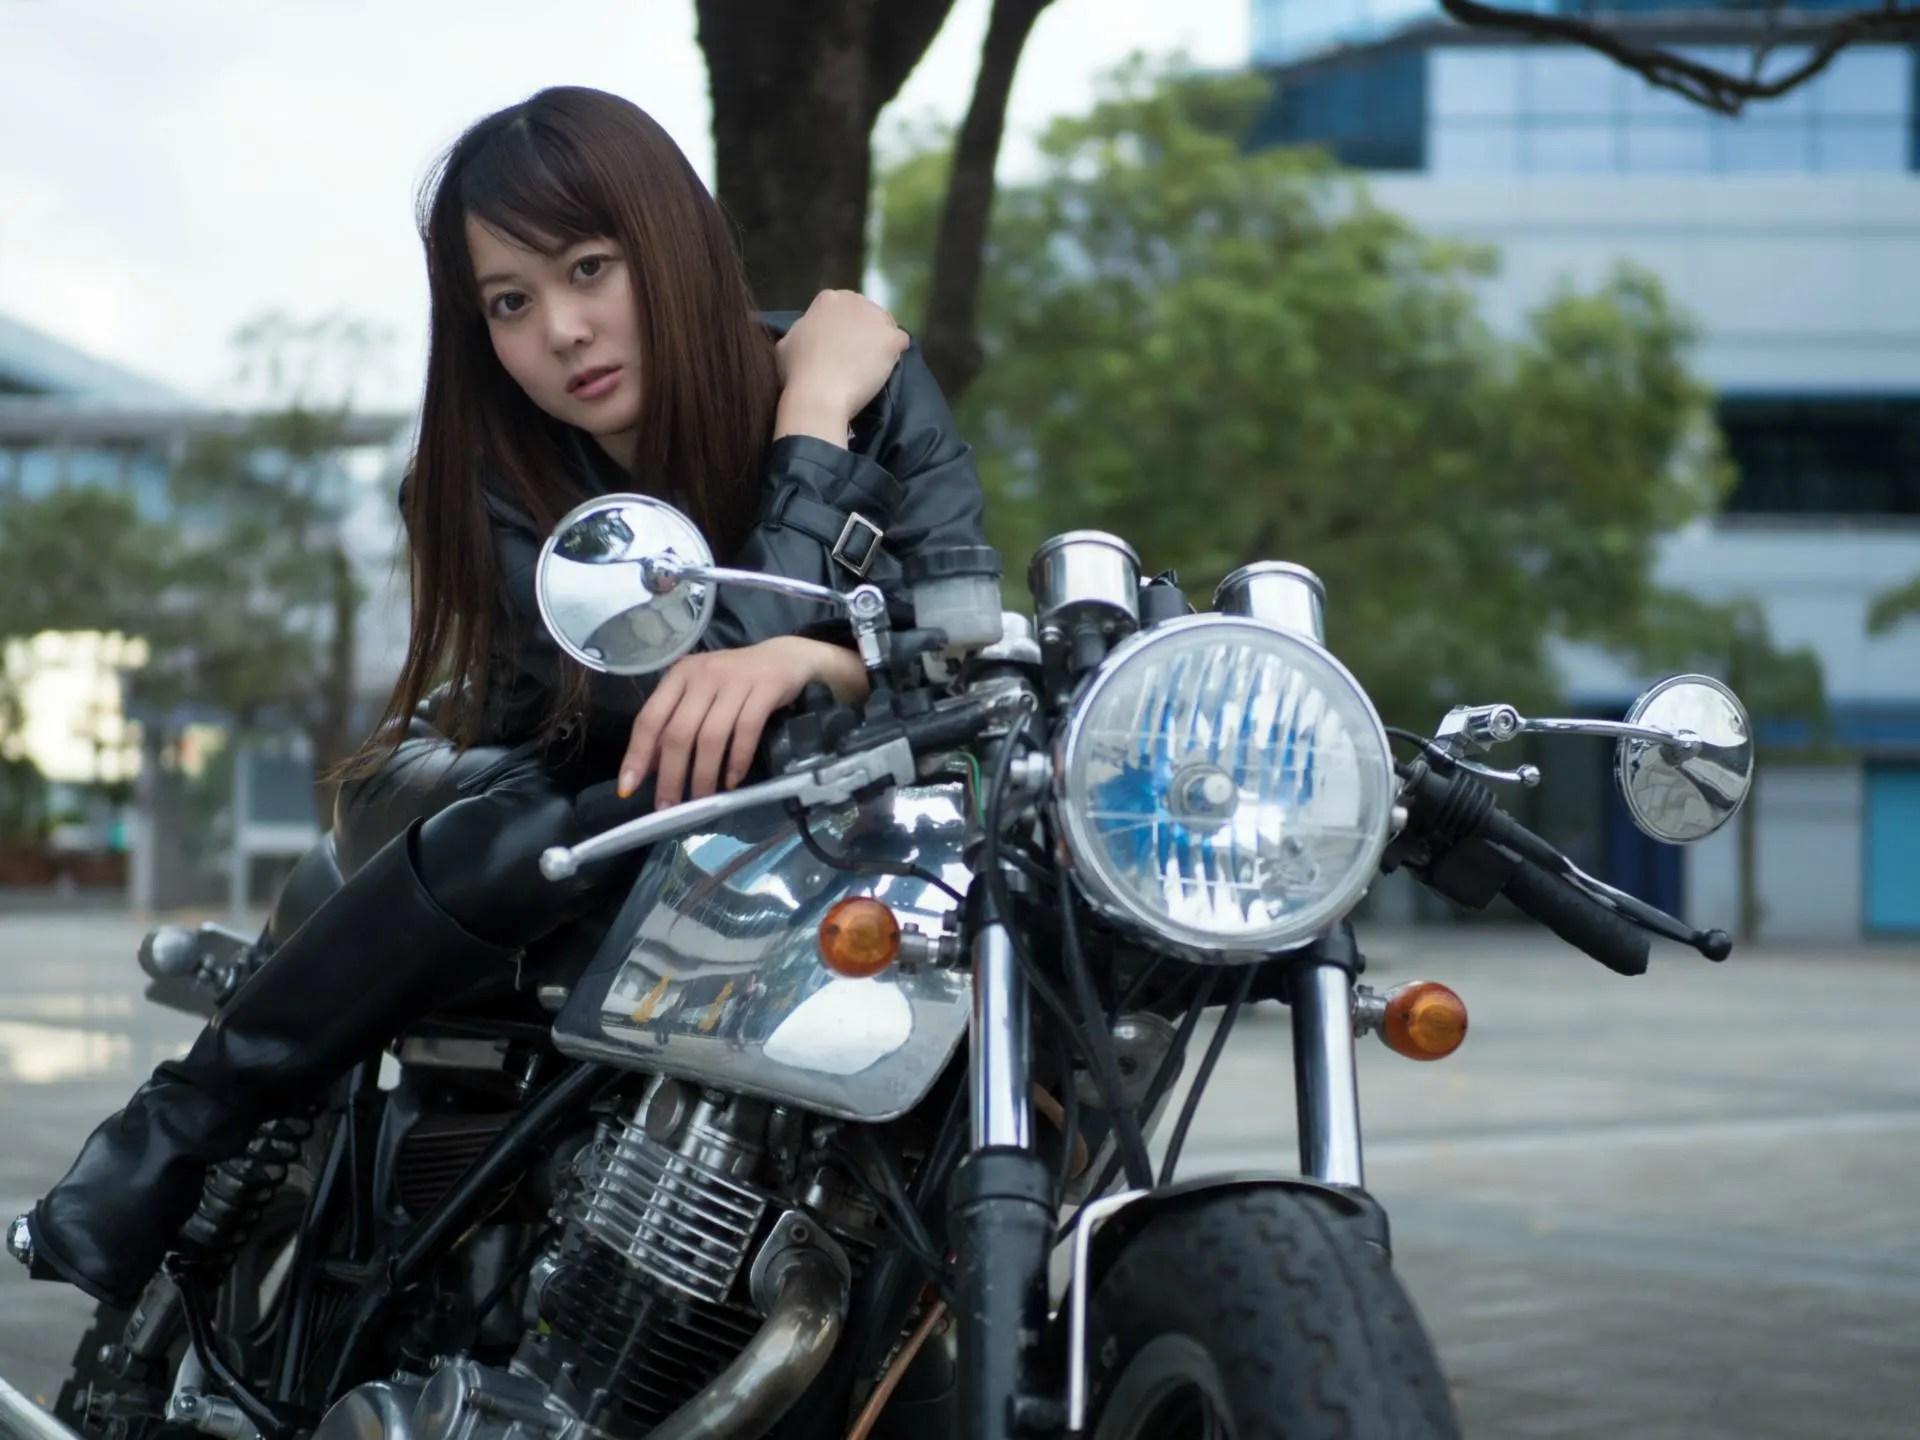 Nice Girl Wallpaper Hd 柳原ゆうさん Festasole Bike撮影会 2016年12月3日 Vol 4 無断転載、無断2次利用禁止です